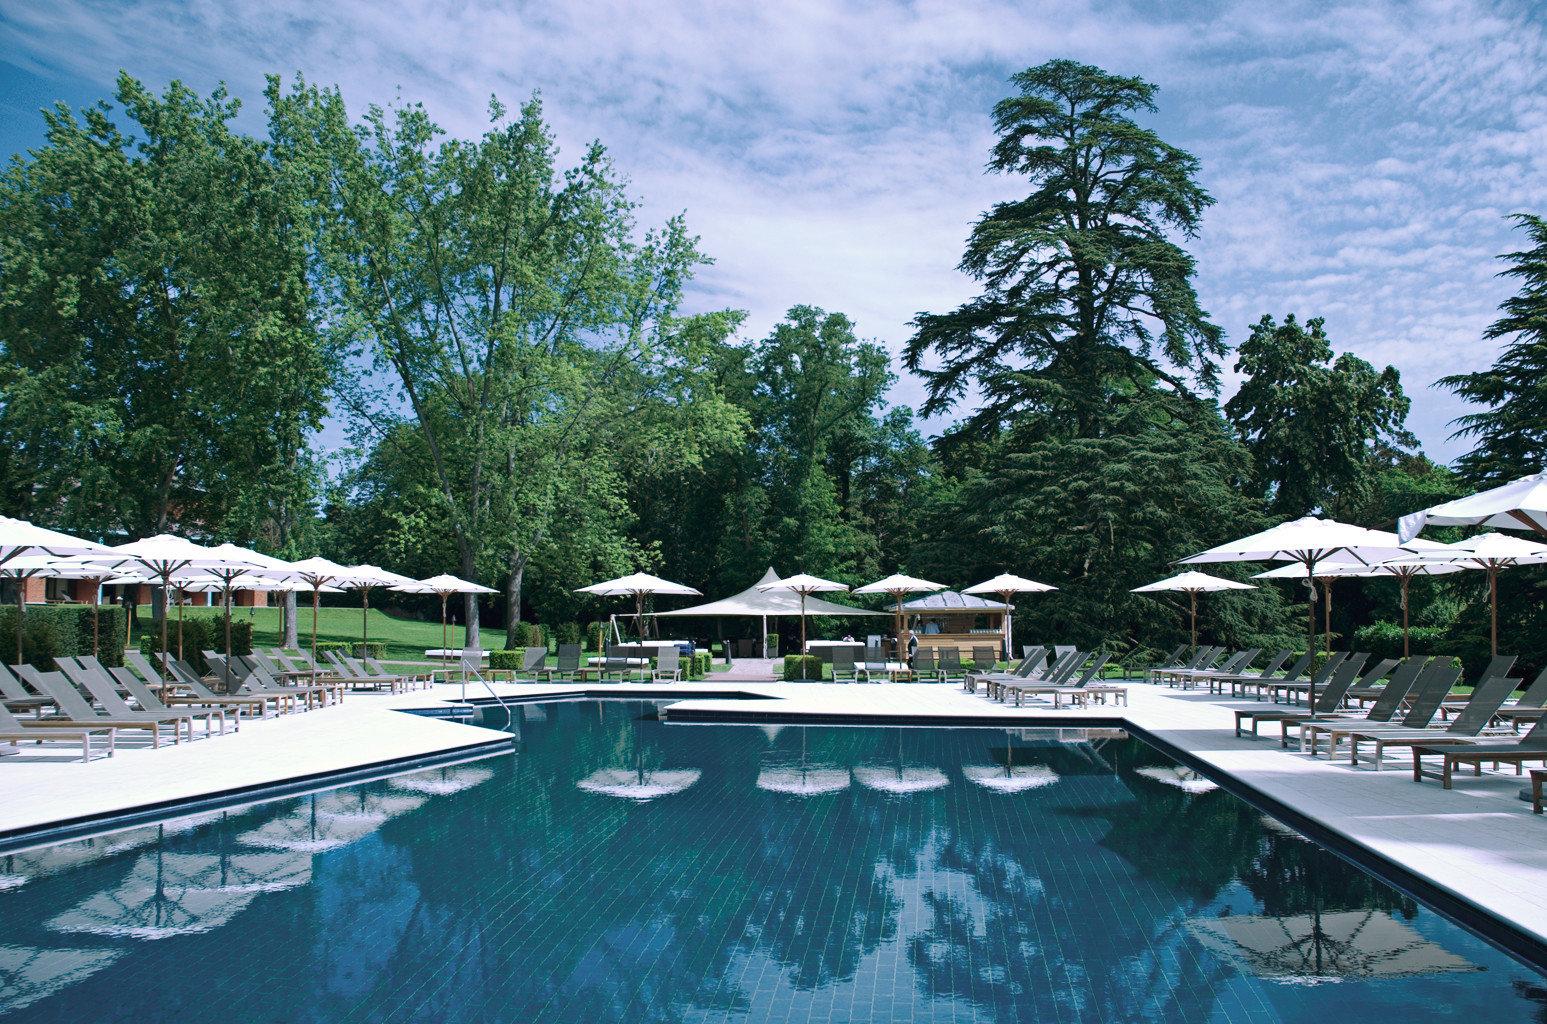 Grounds Outdoors Wellness tree swimming pool leisure property Resort resort town backyard Villa lined swimming day